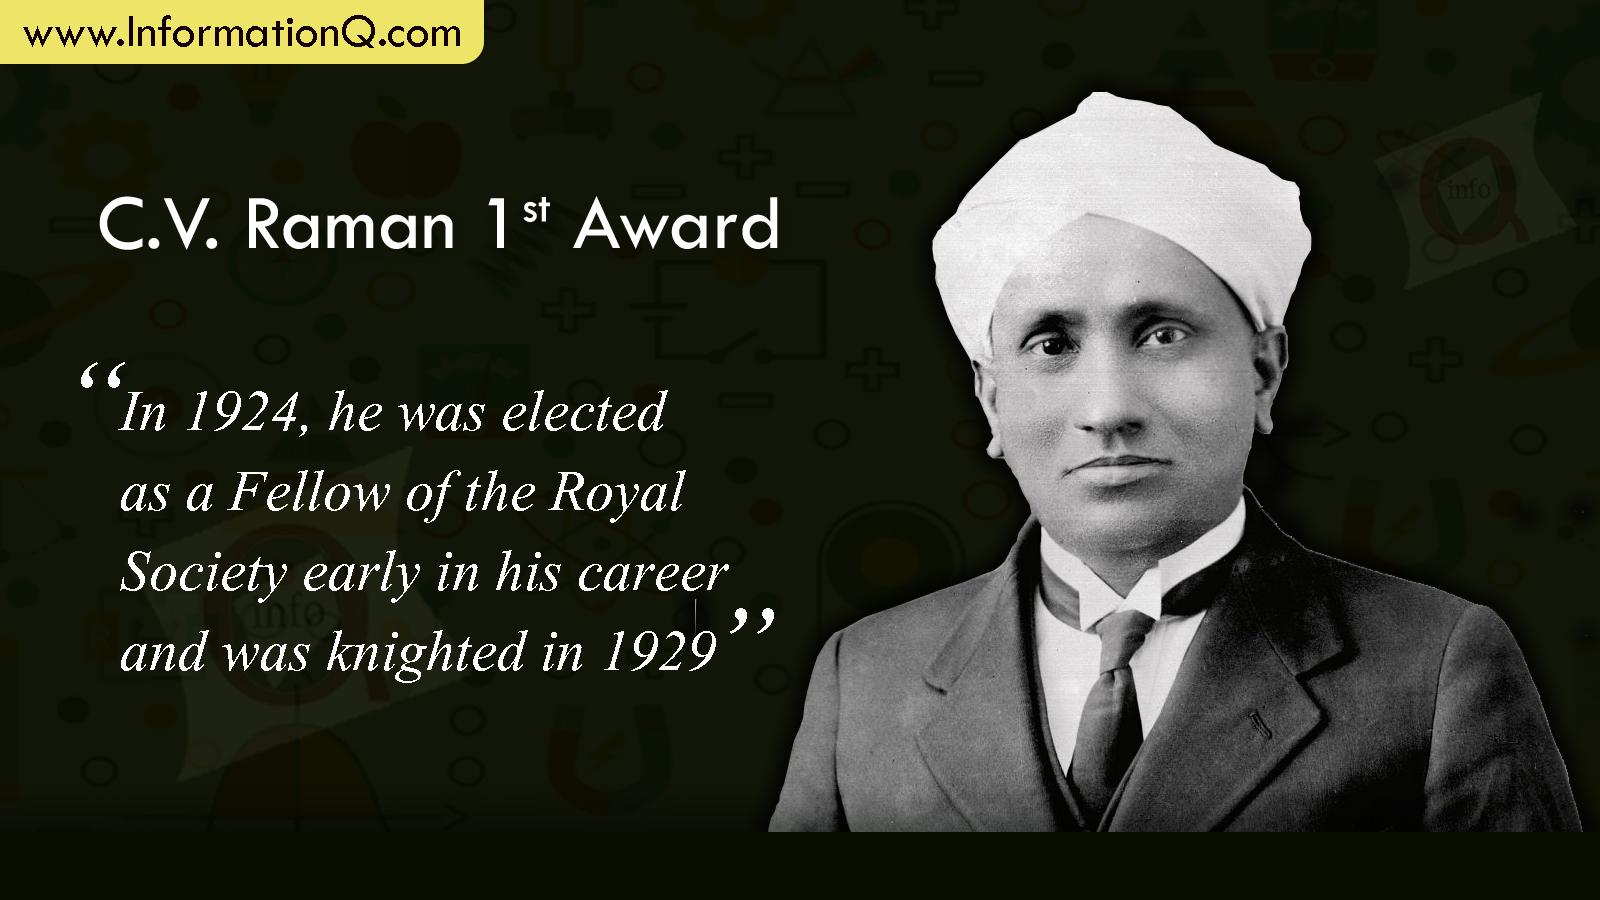 C.V. Raman 1st Award